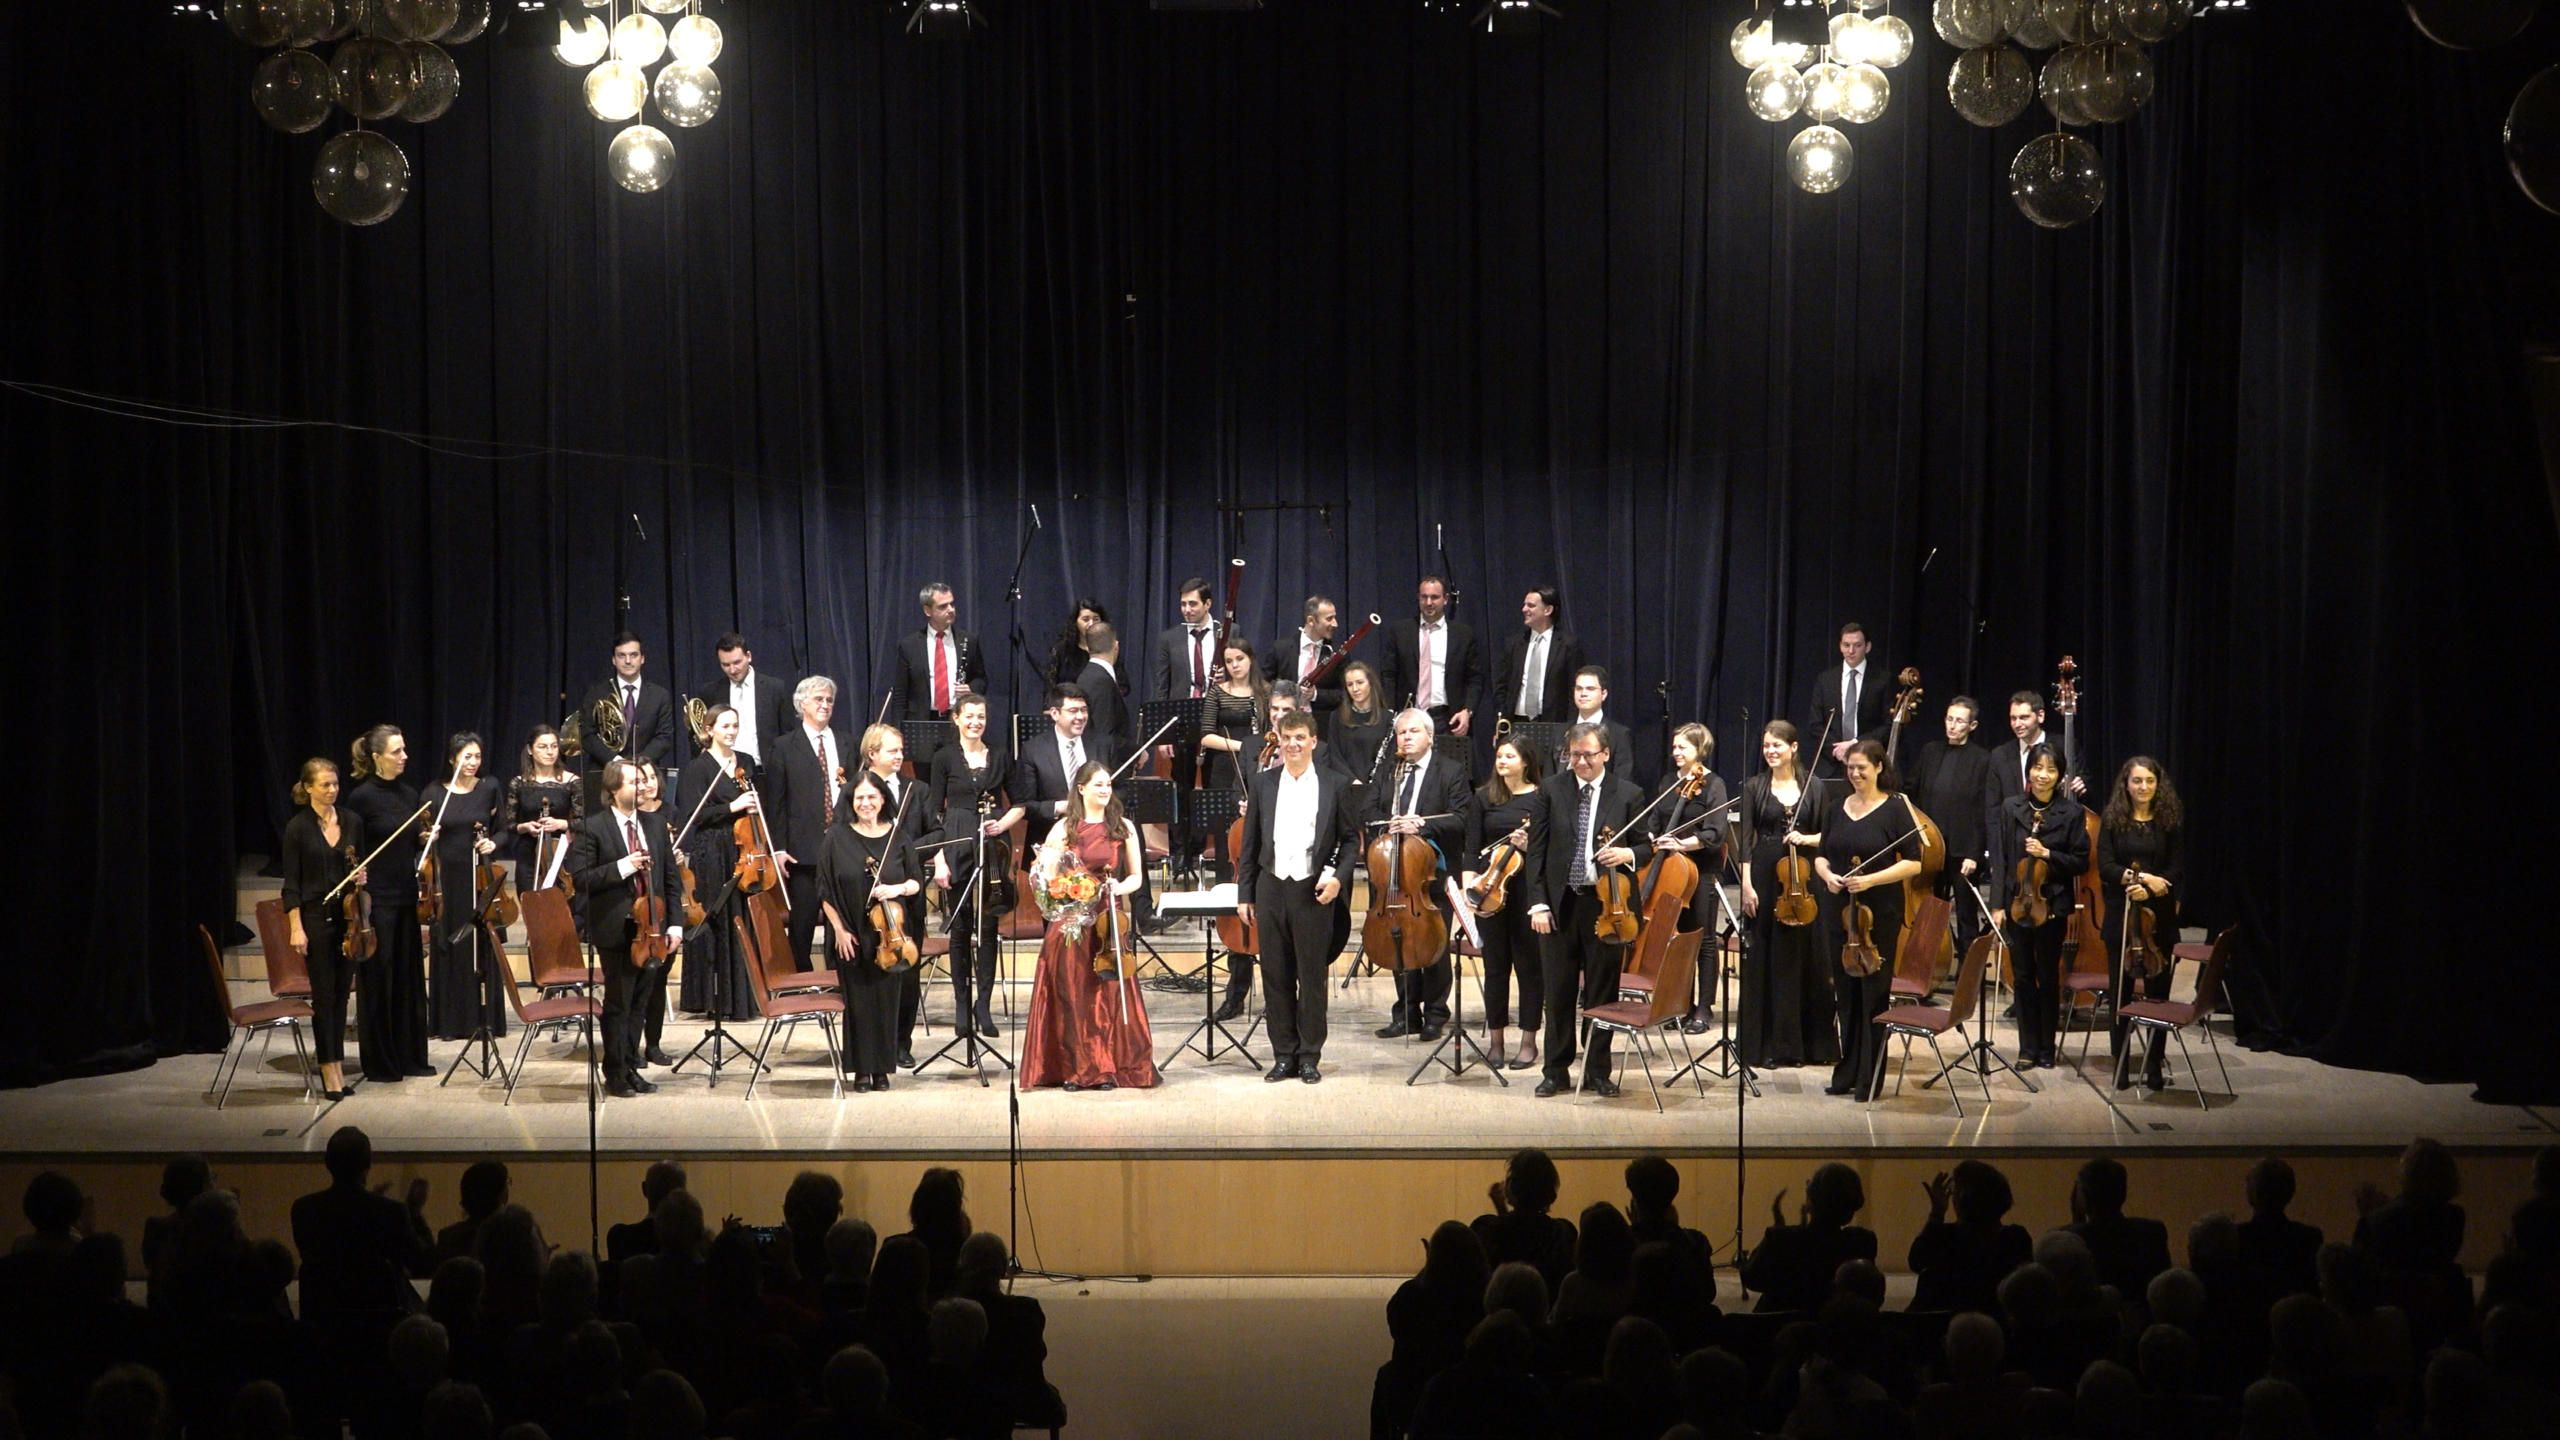 Jubiläumskonzert - 250 Jahre Ludwig van Beethoven 1